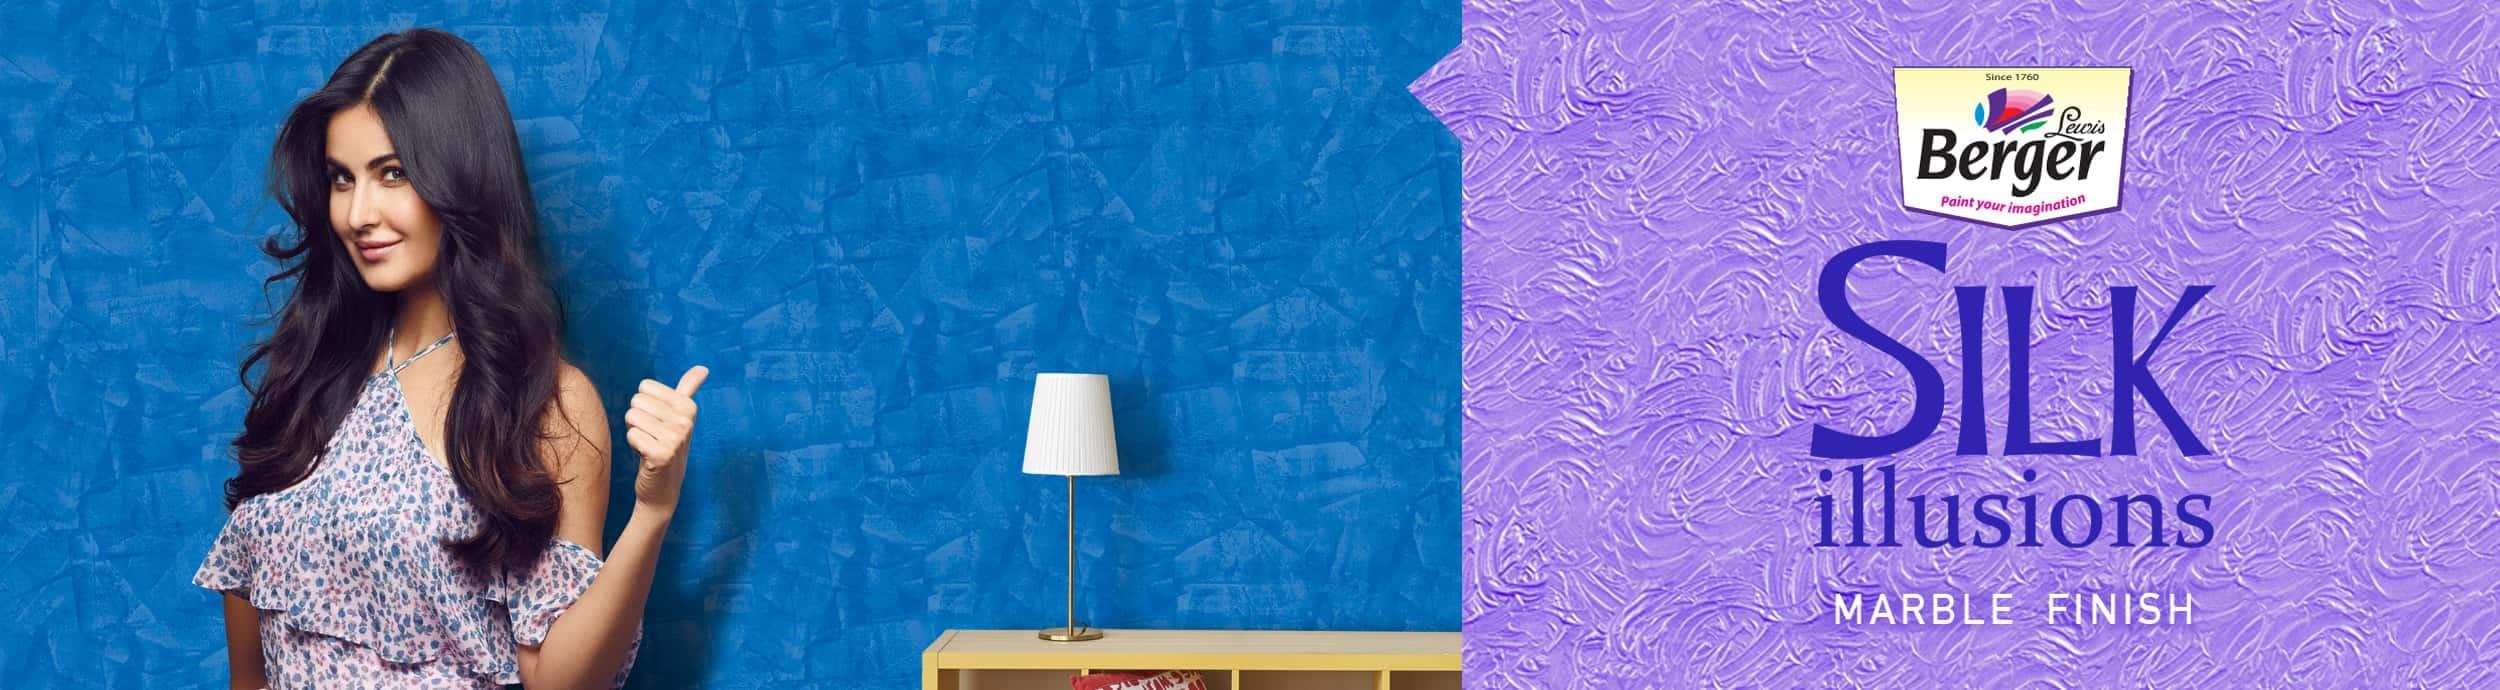 Berger paints illusions wall fashion 84